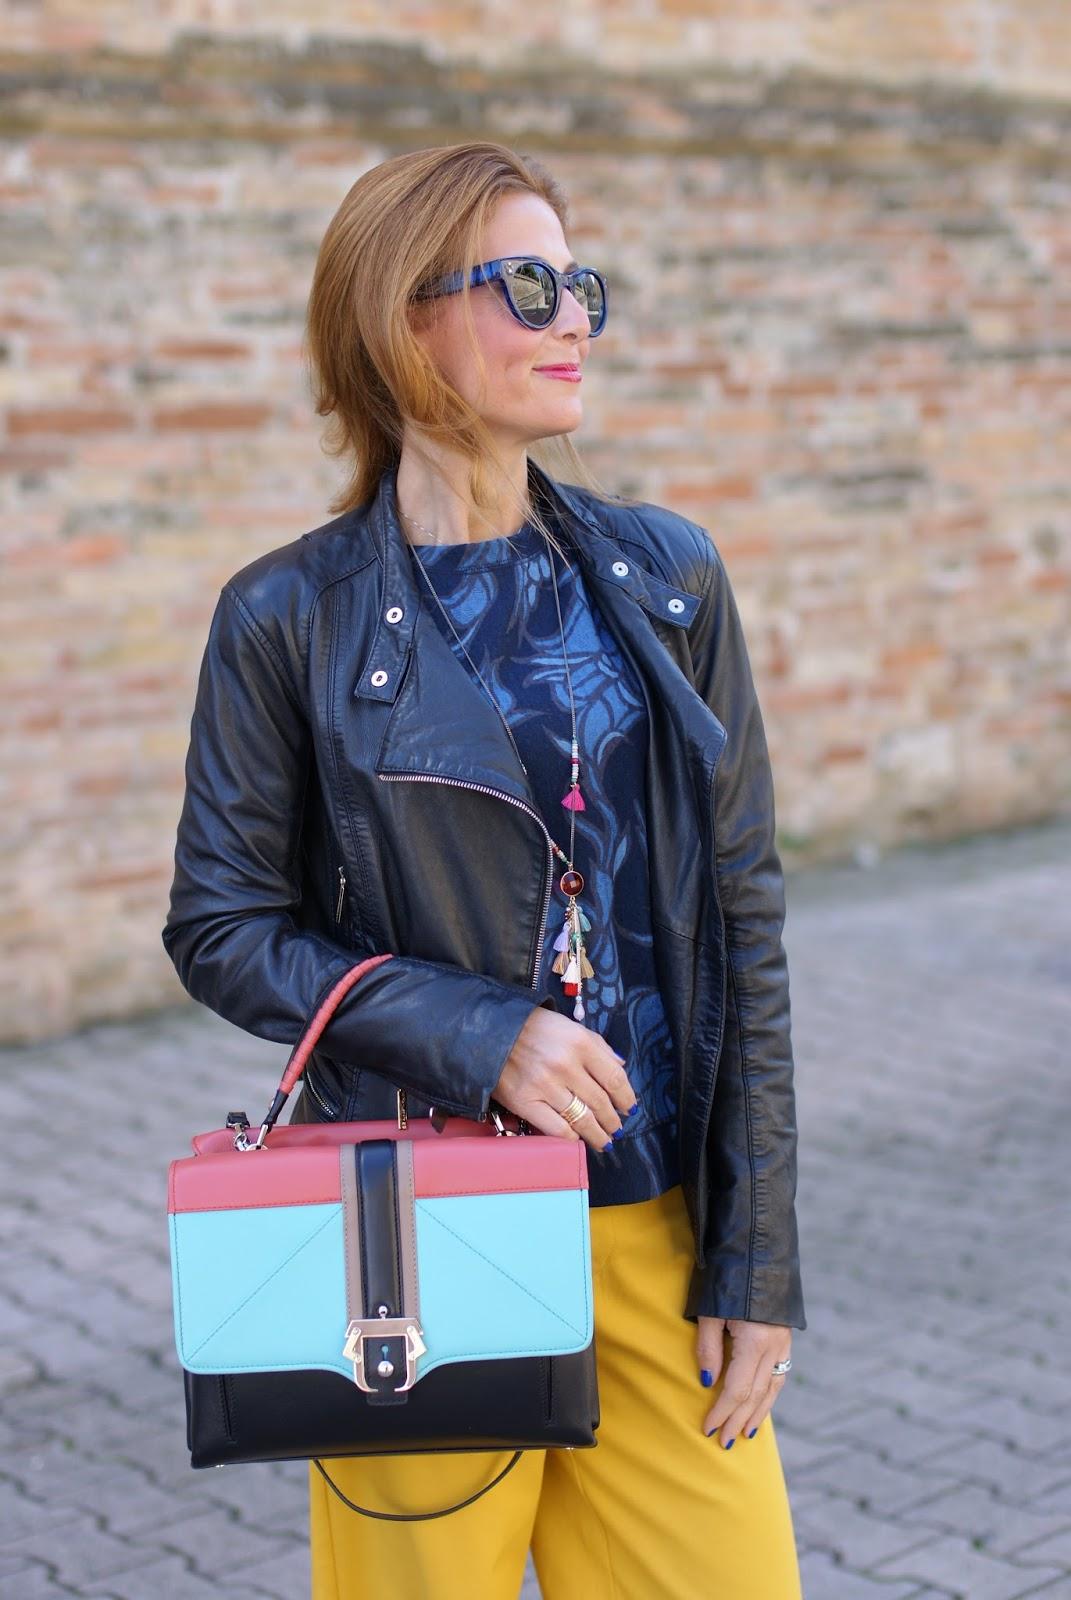 Paula Cademartori Faye handbag, leather jacket from Elisabetta Franchi and Hype Glass on Fashion and Cookies fashion blog